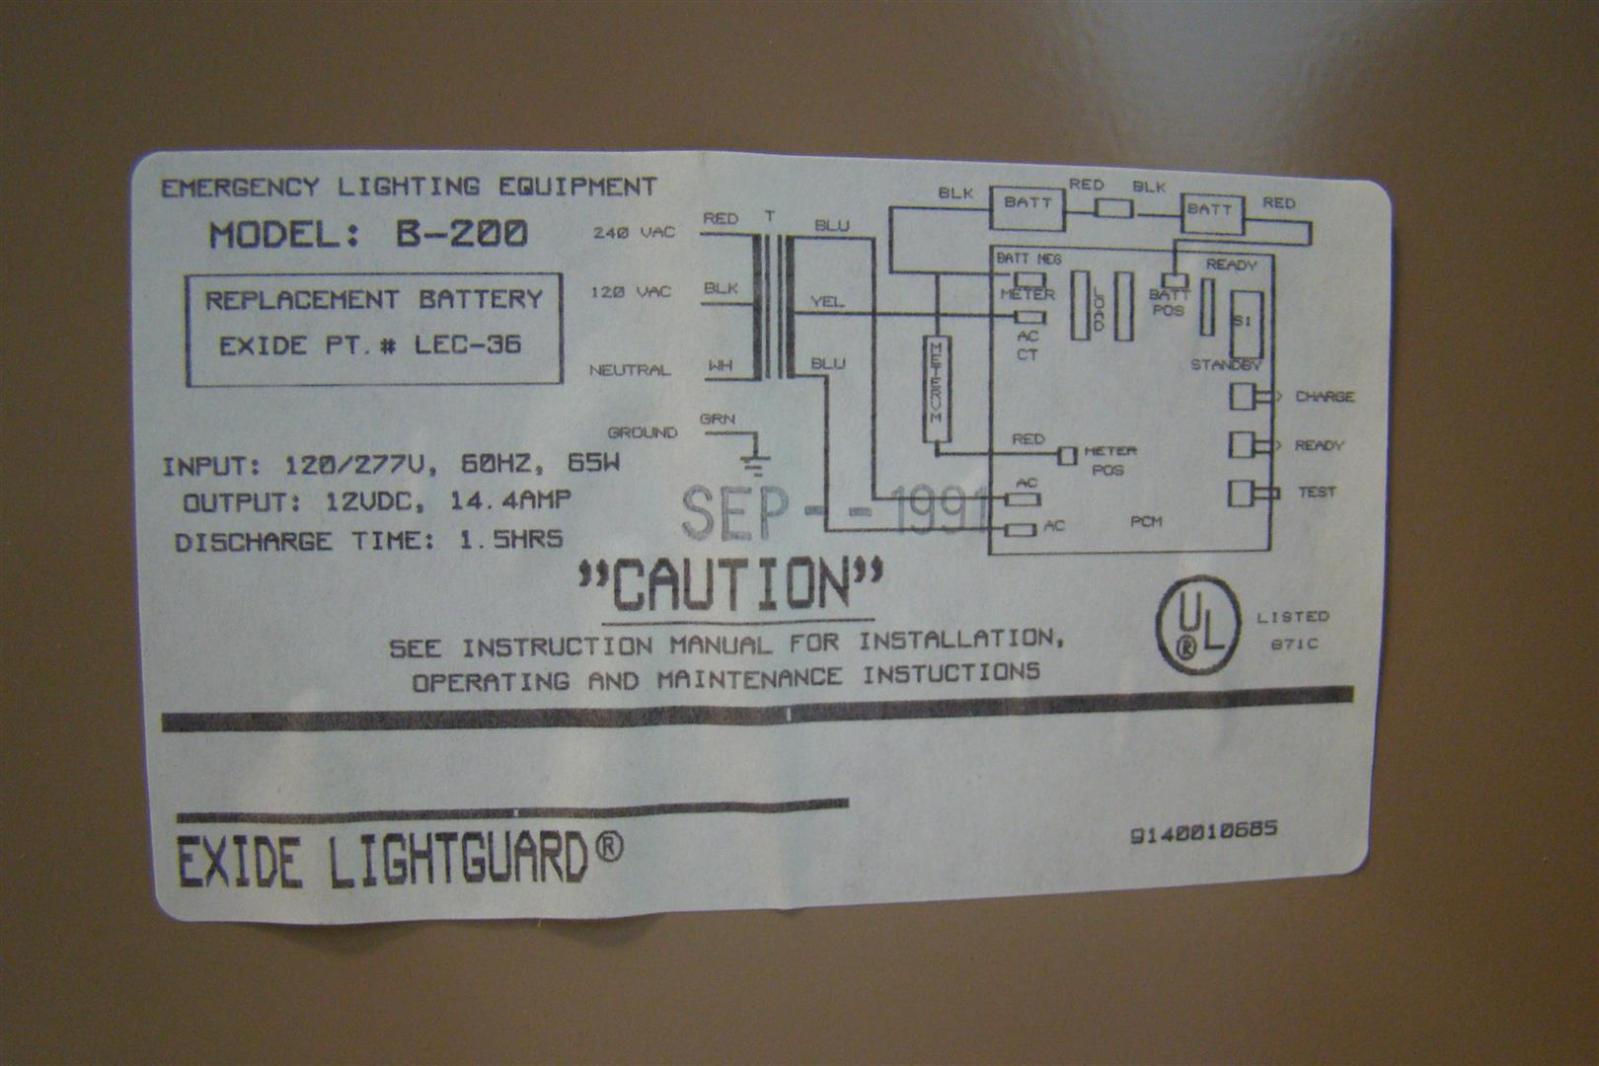 0ef796 hertner battery charger wiring diagram wiring resources solar charger diagram hertner battery charger wiring diagram #9